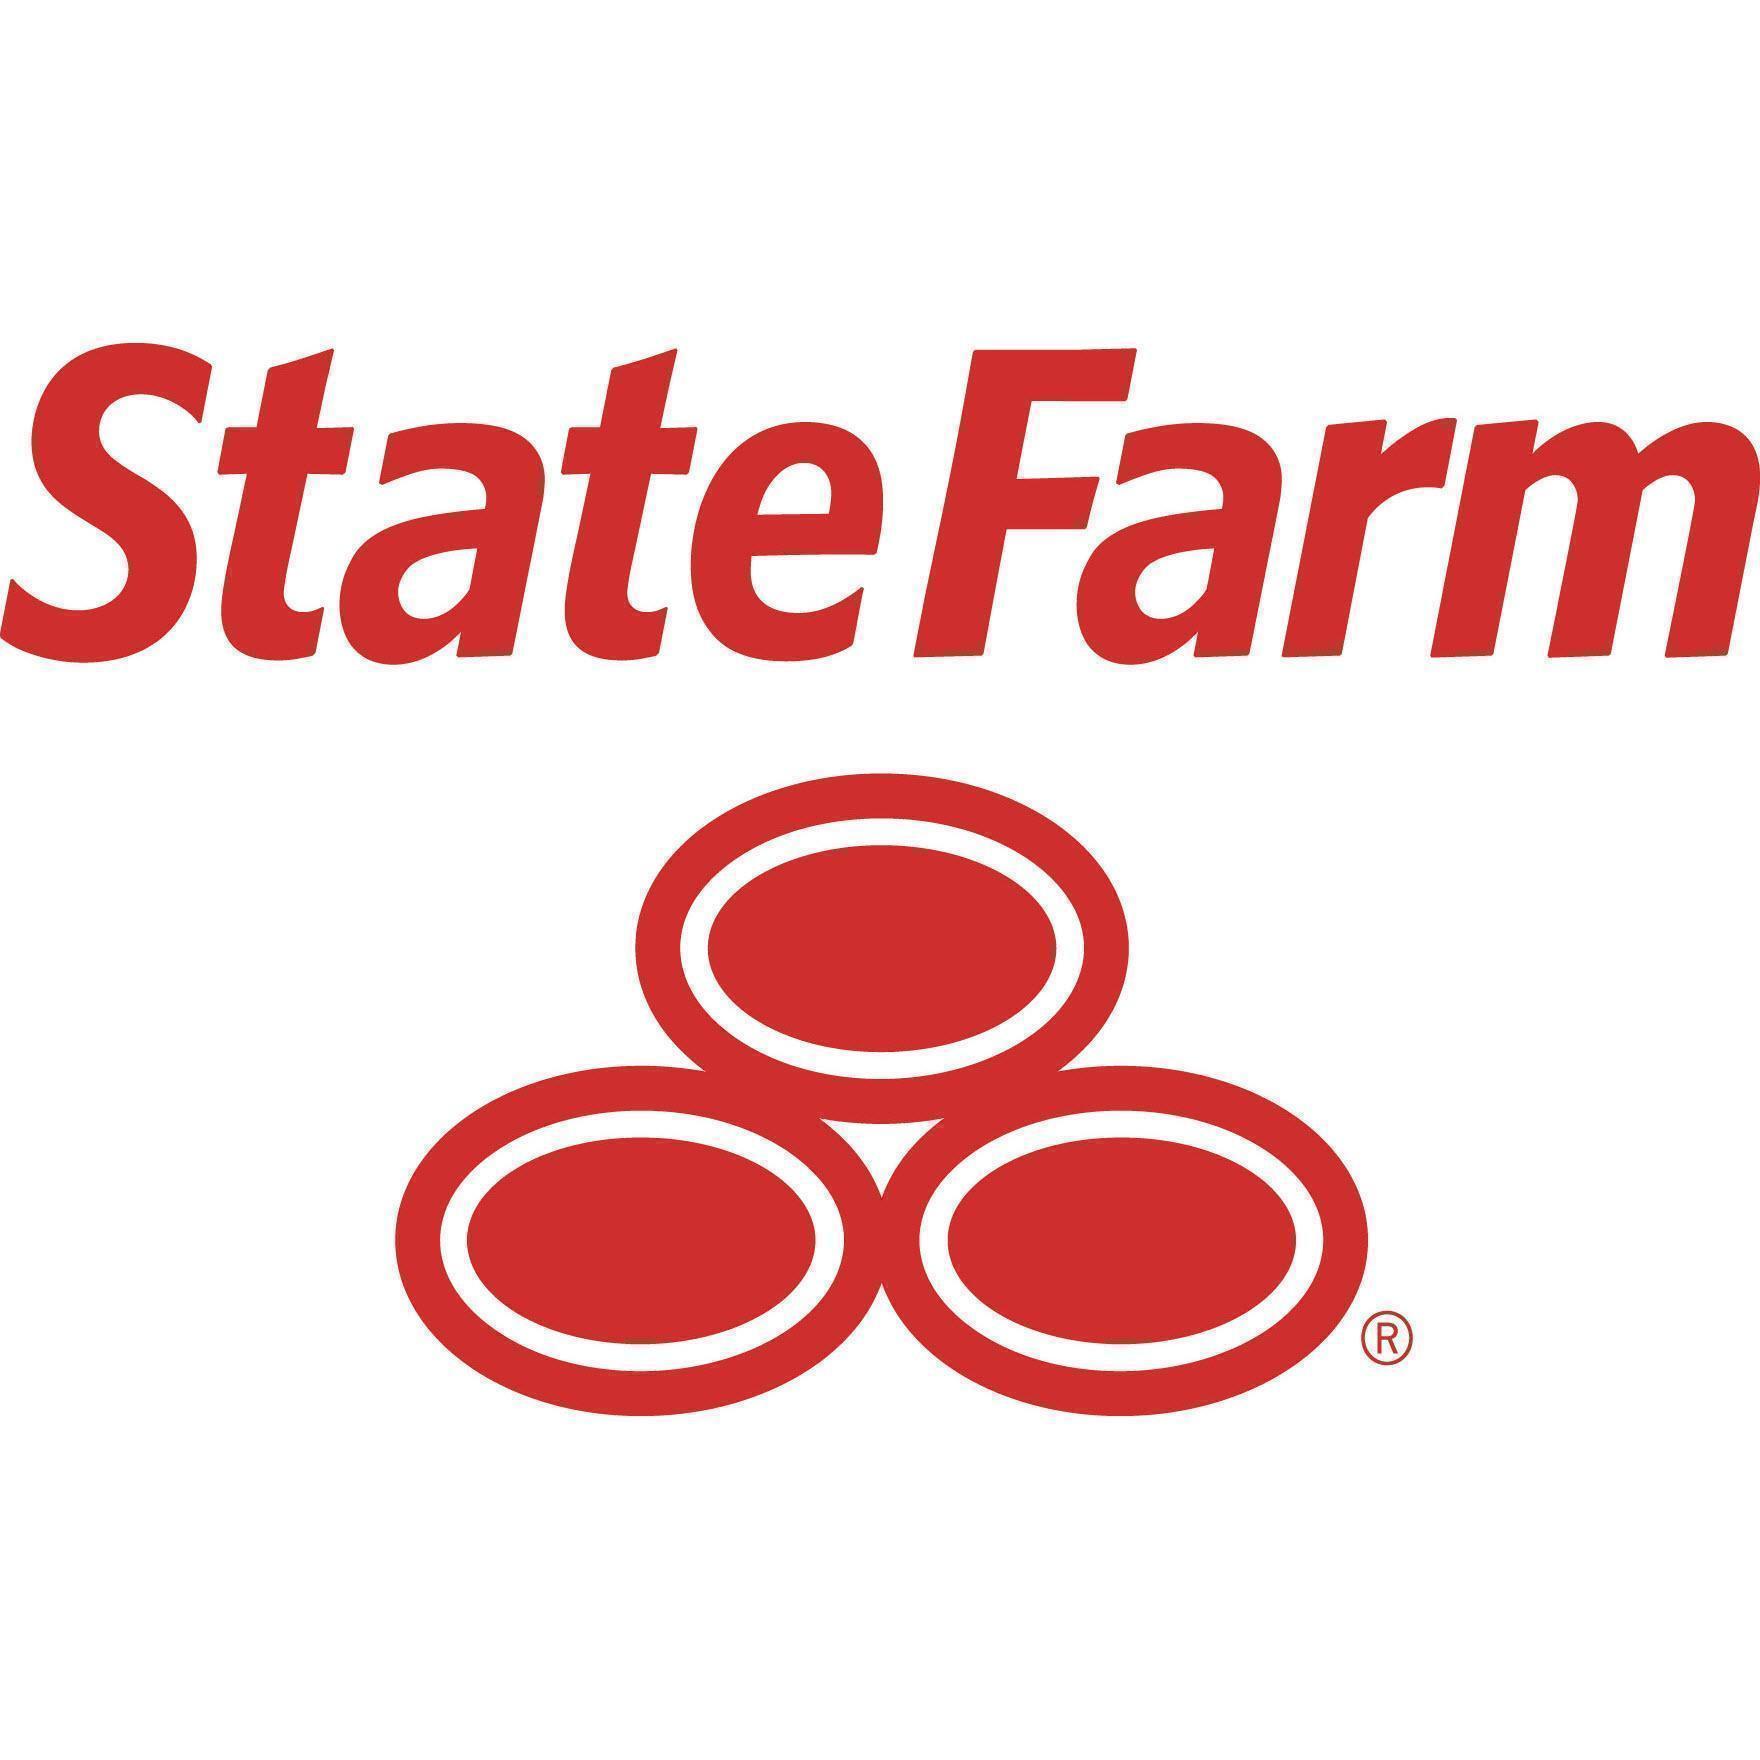 Steve Dwight - State Farm Insurance Agent